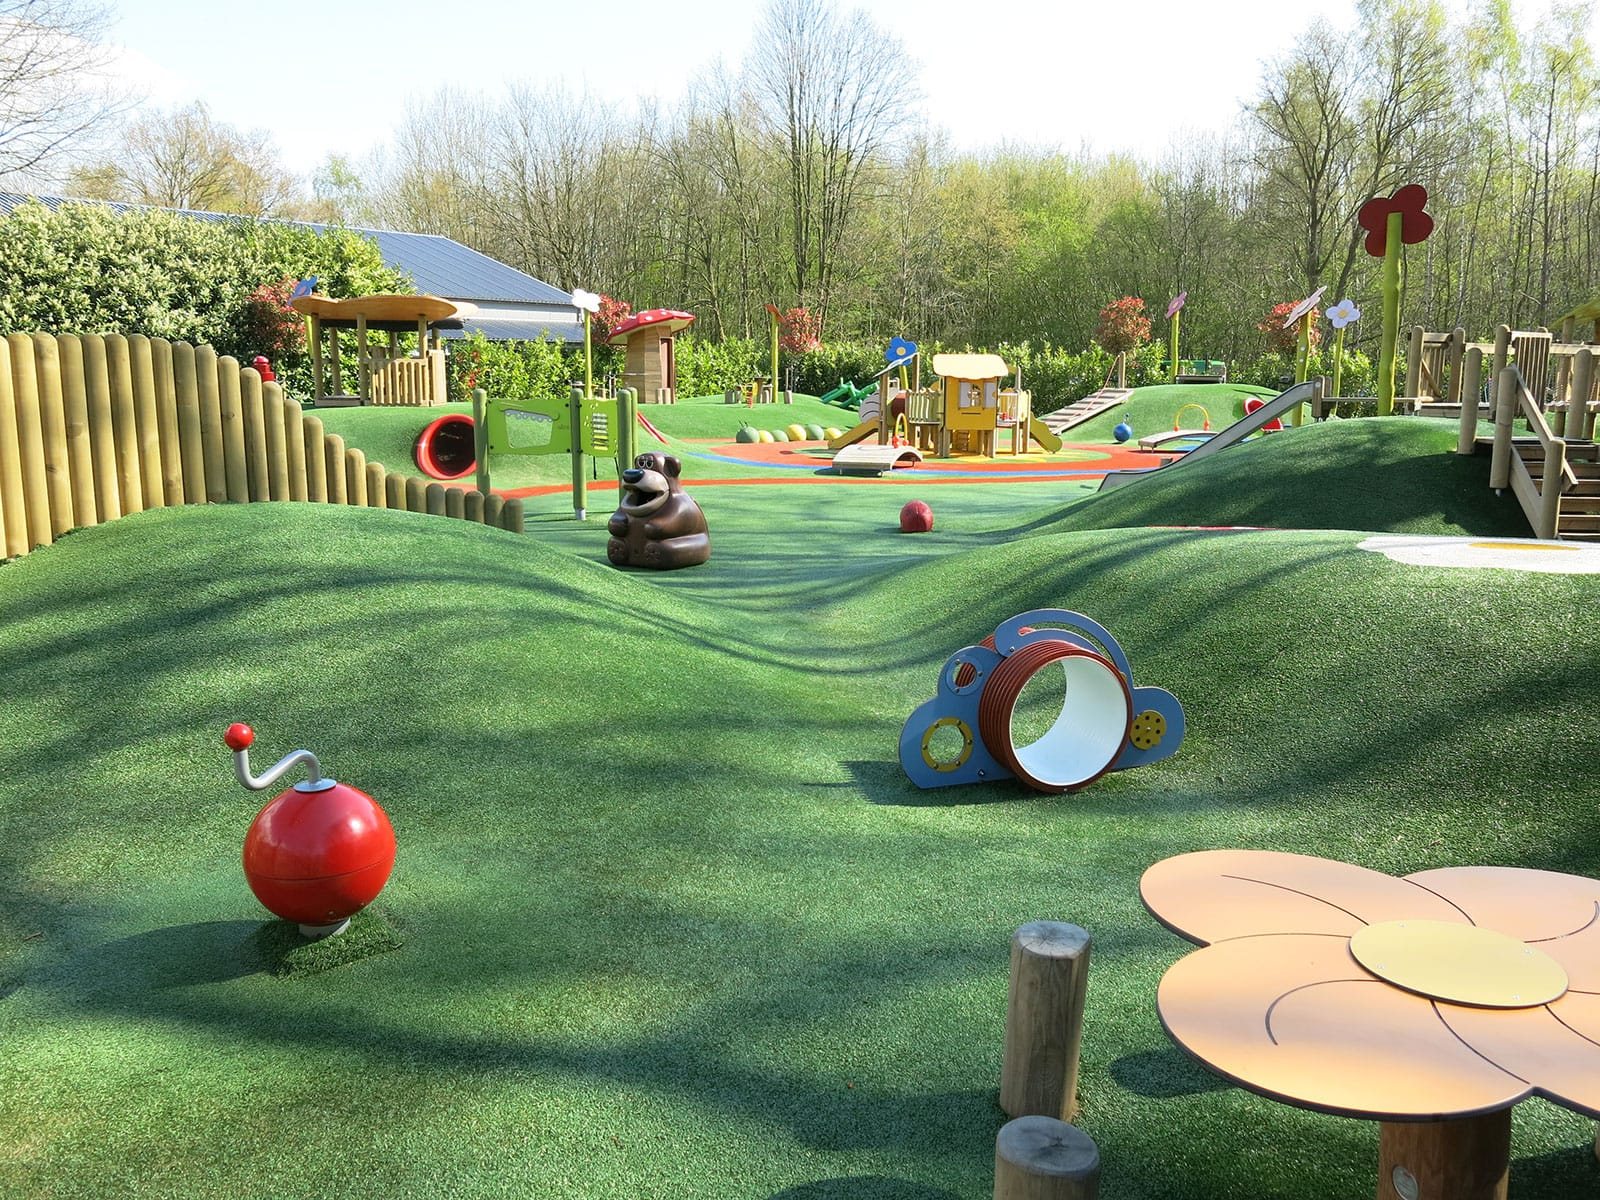 coaster trips 2016 speelpark oud valkeveen duinrell